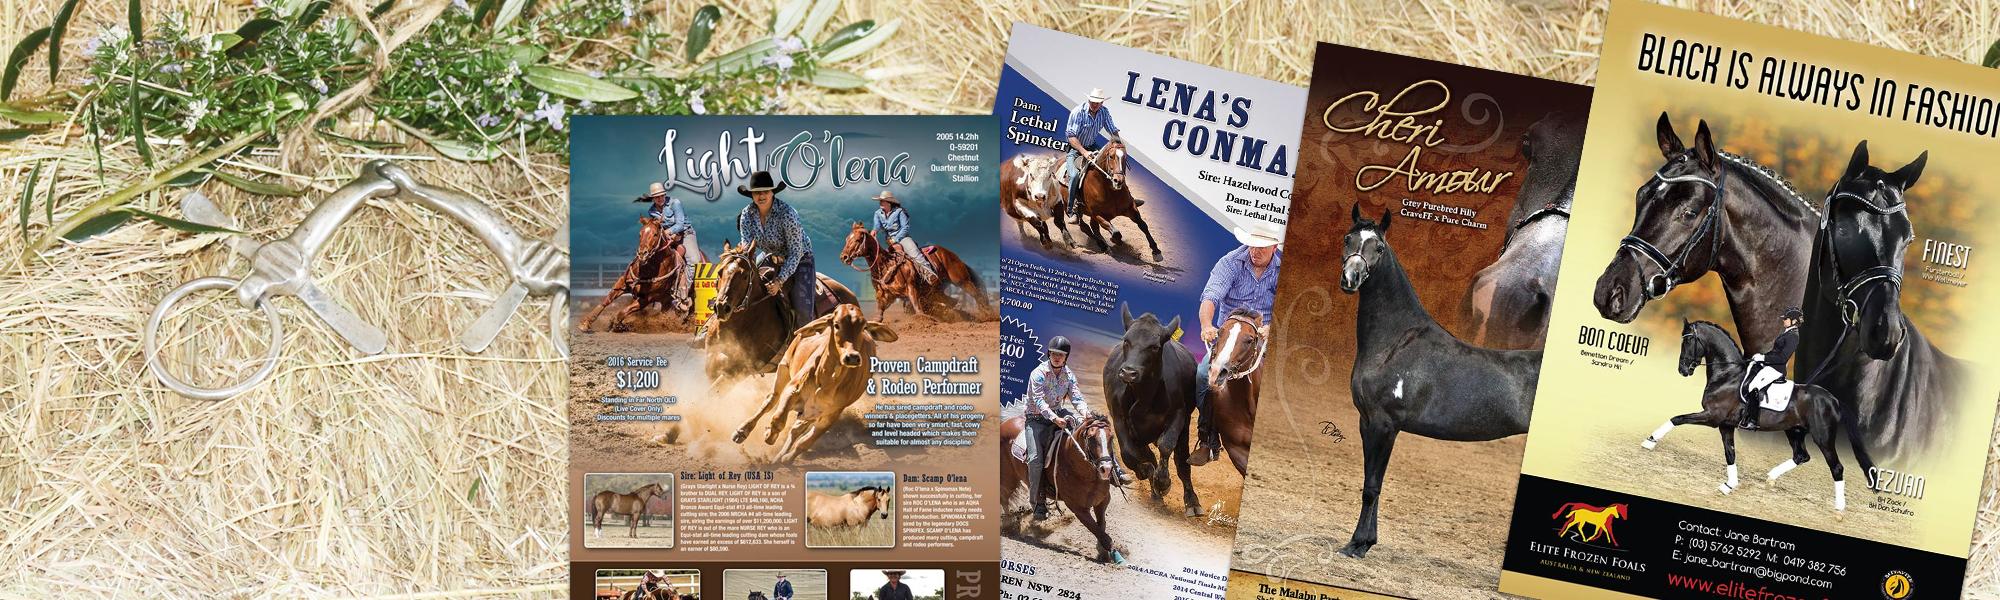 Equine Advertisement Design for magazines, social media or print